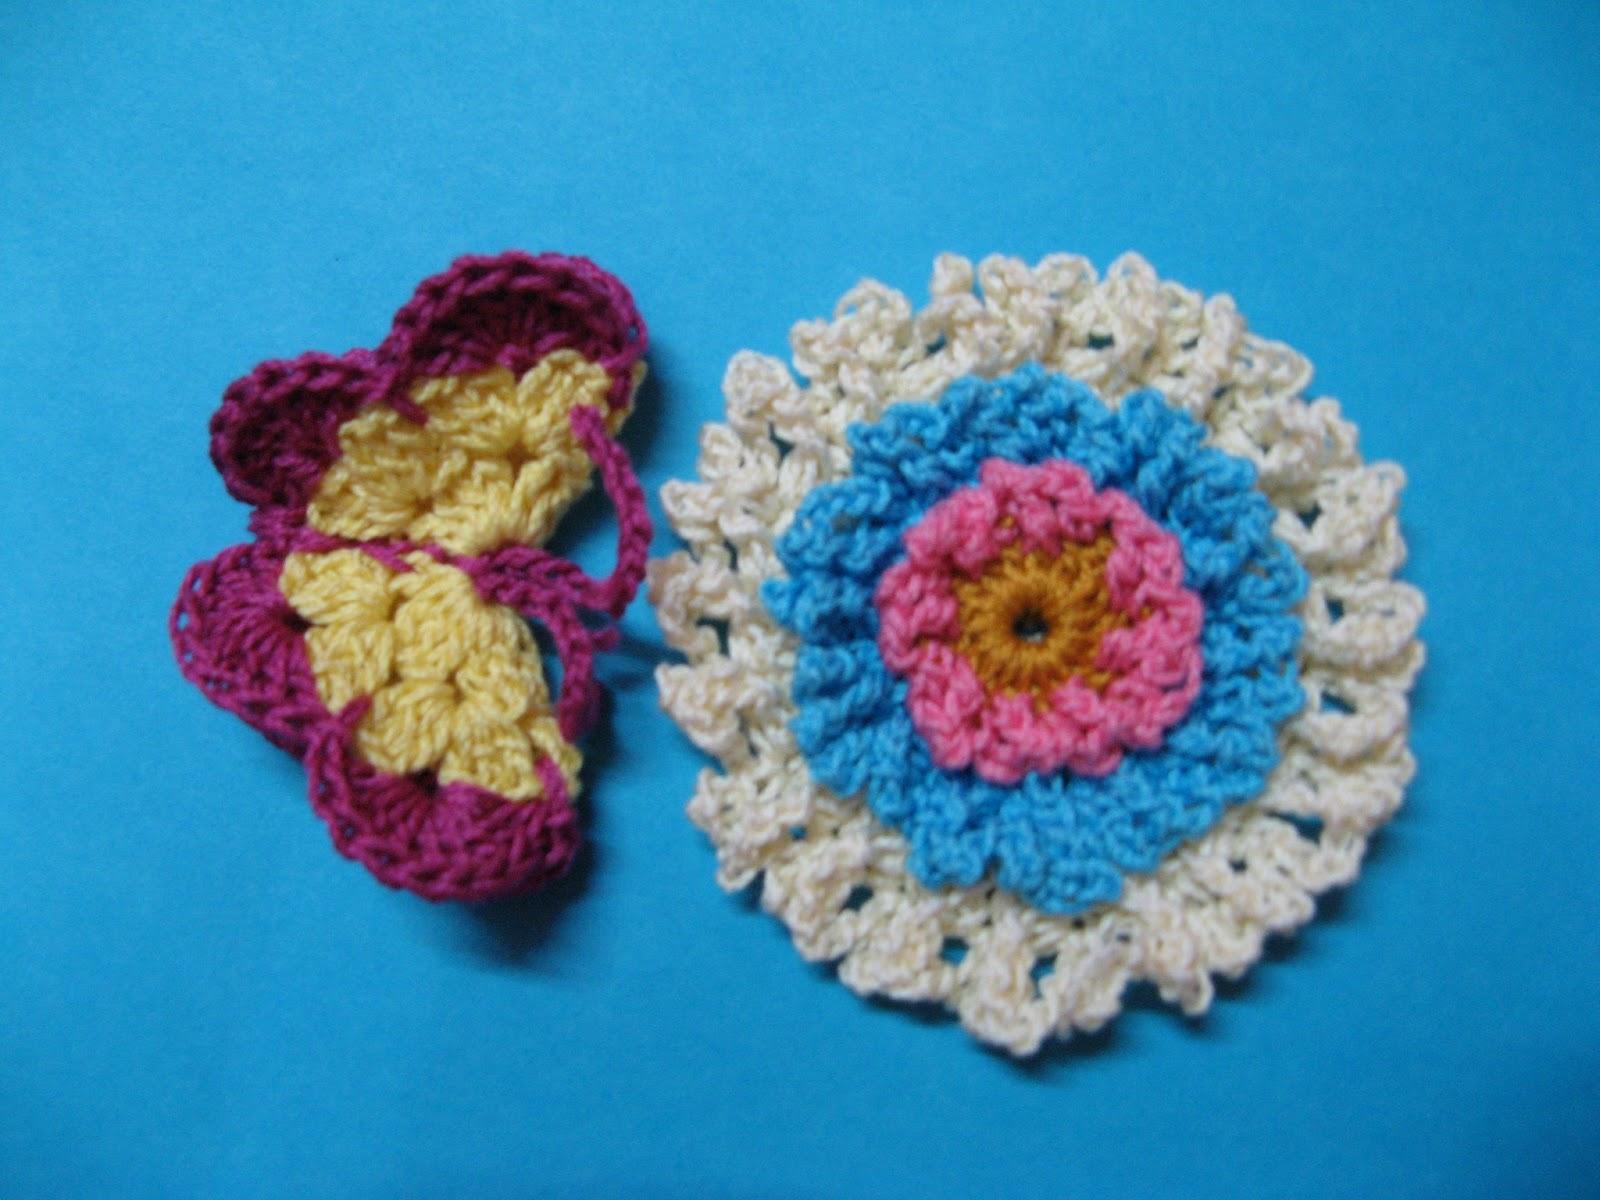 Creat - E - witty Unleashed: A little bit of crochet......